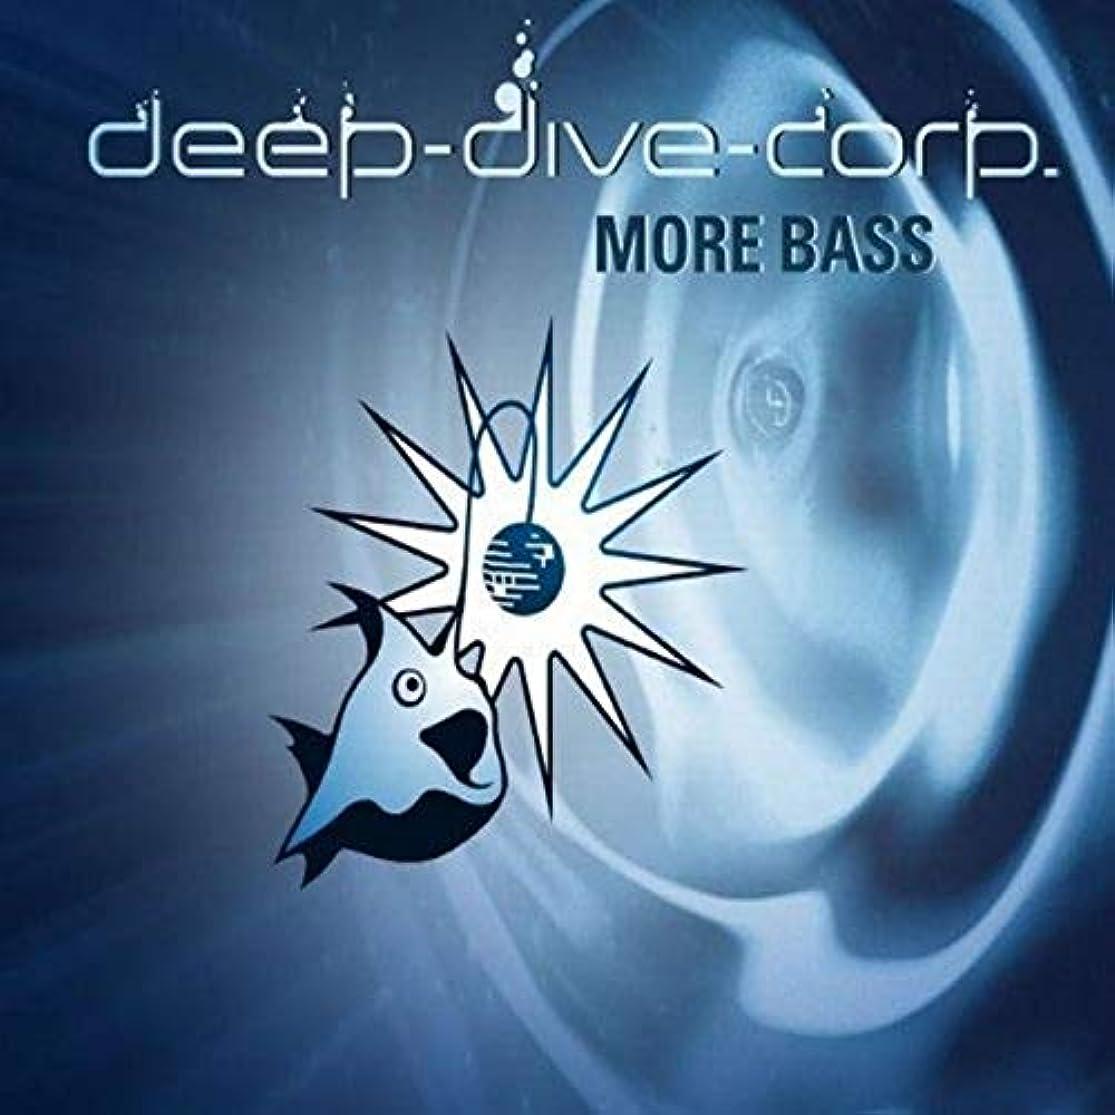 More Bass omvcofiq9